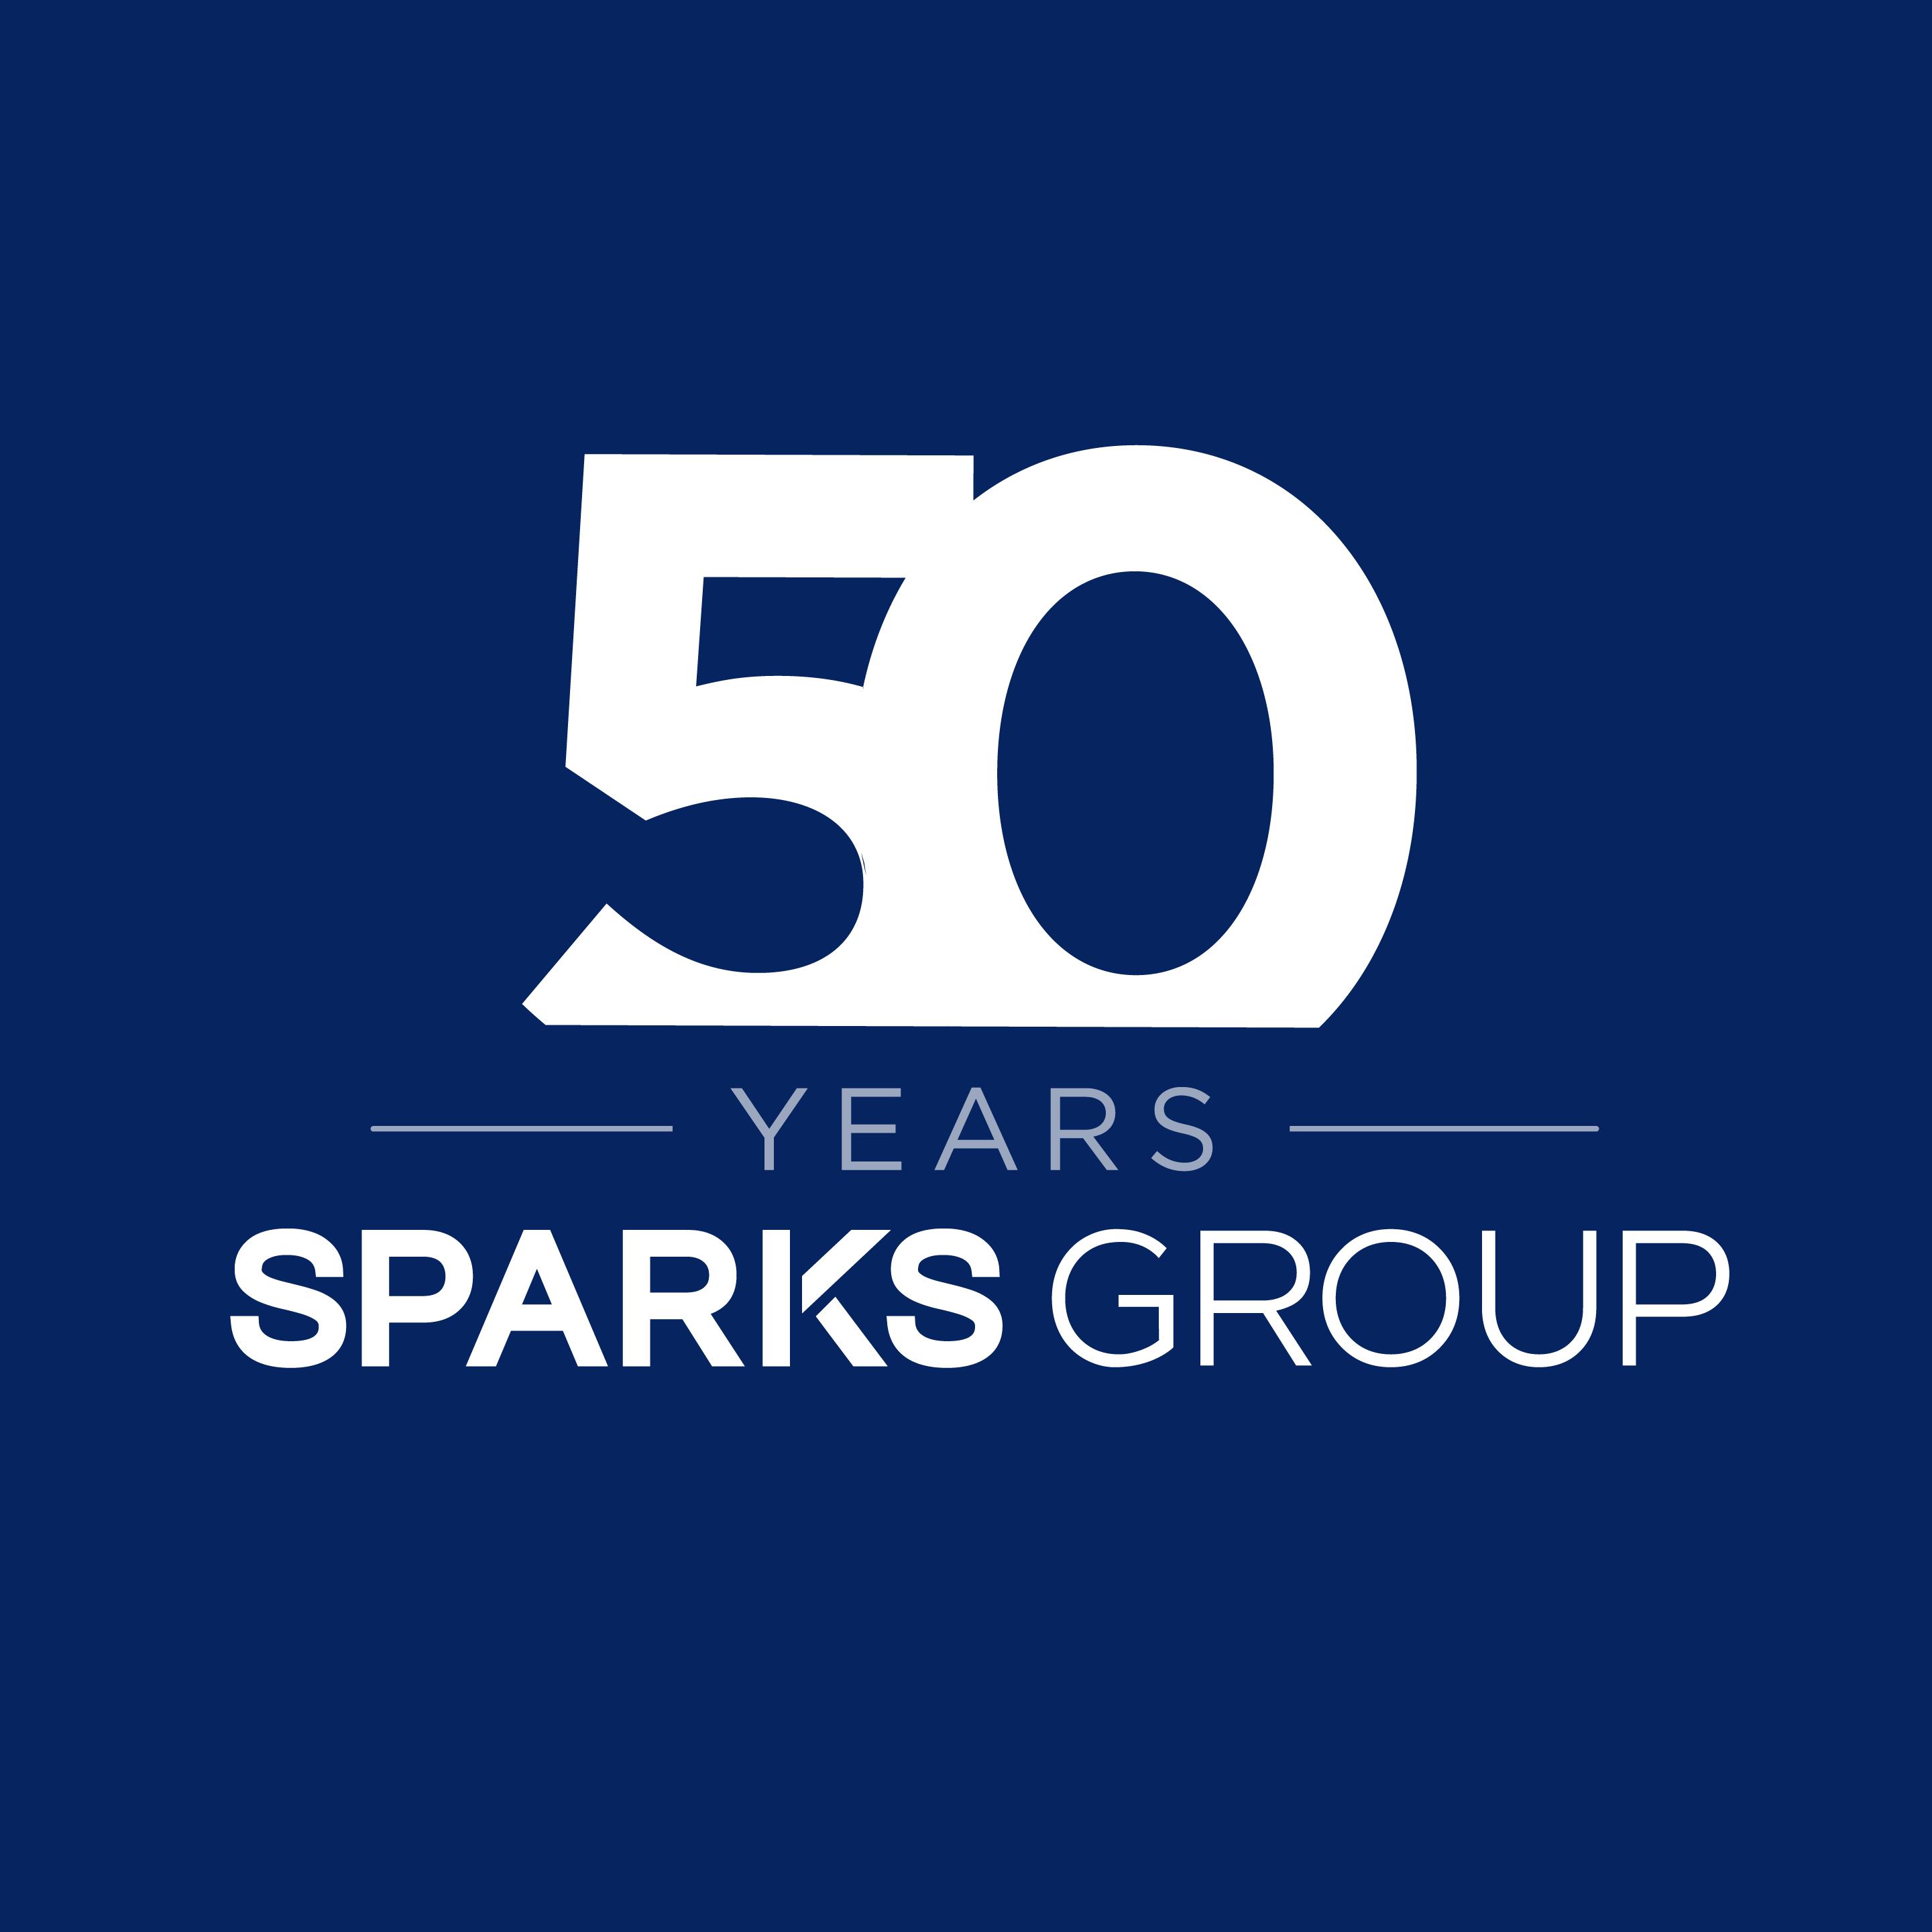 Sparks Group logo